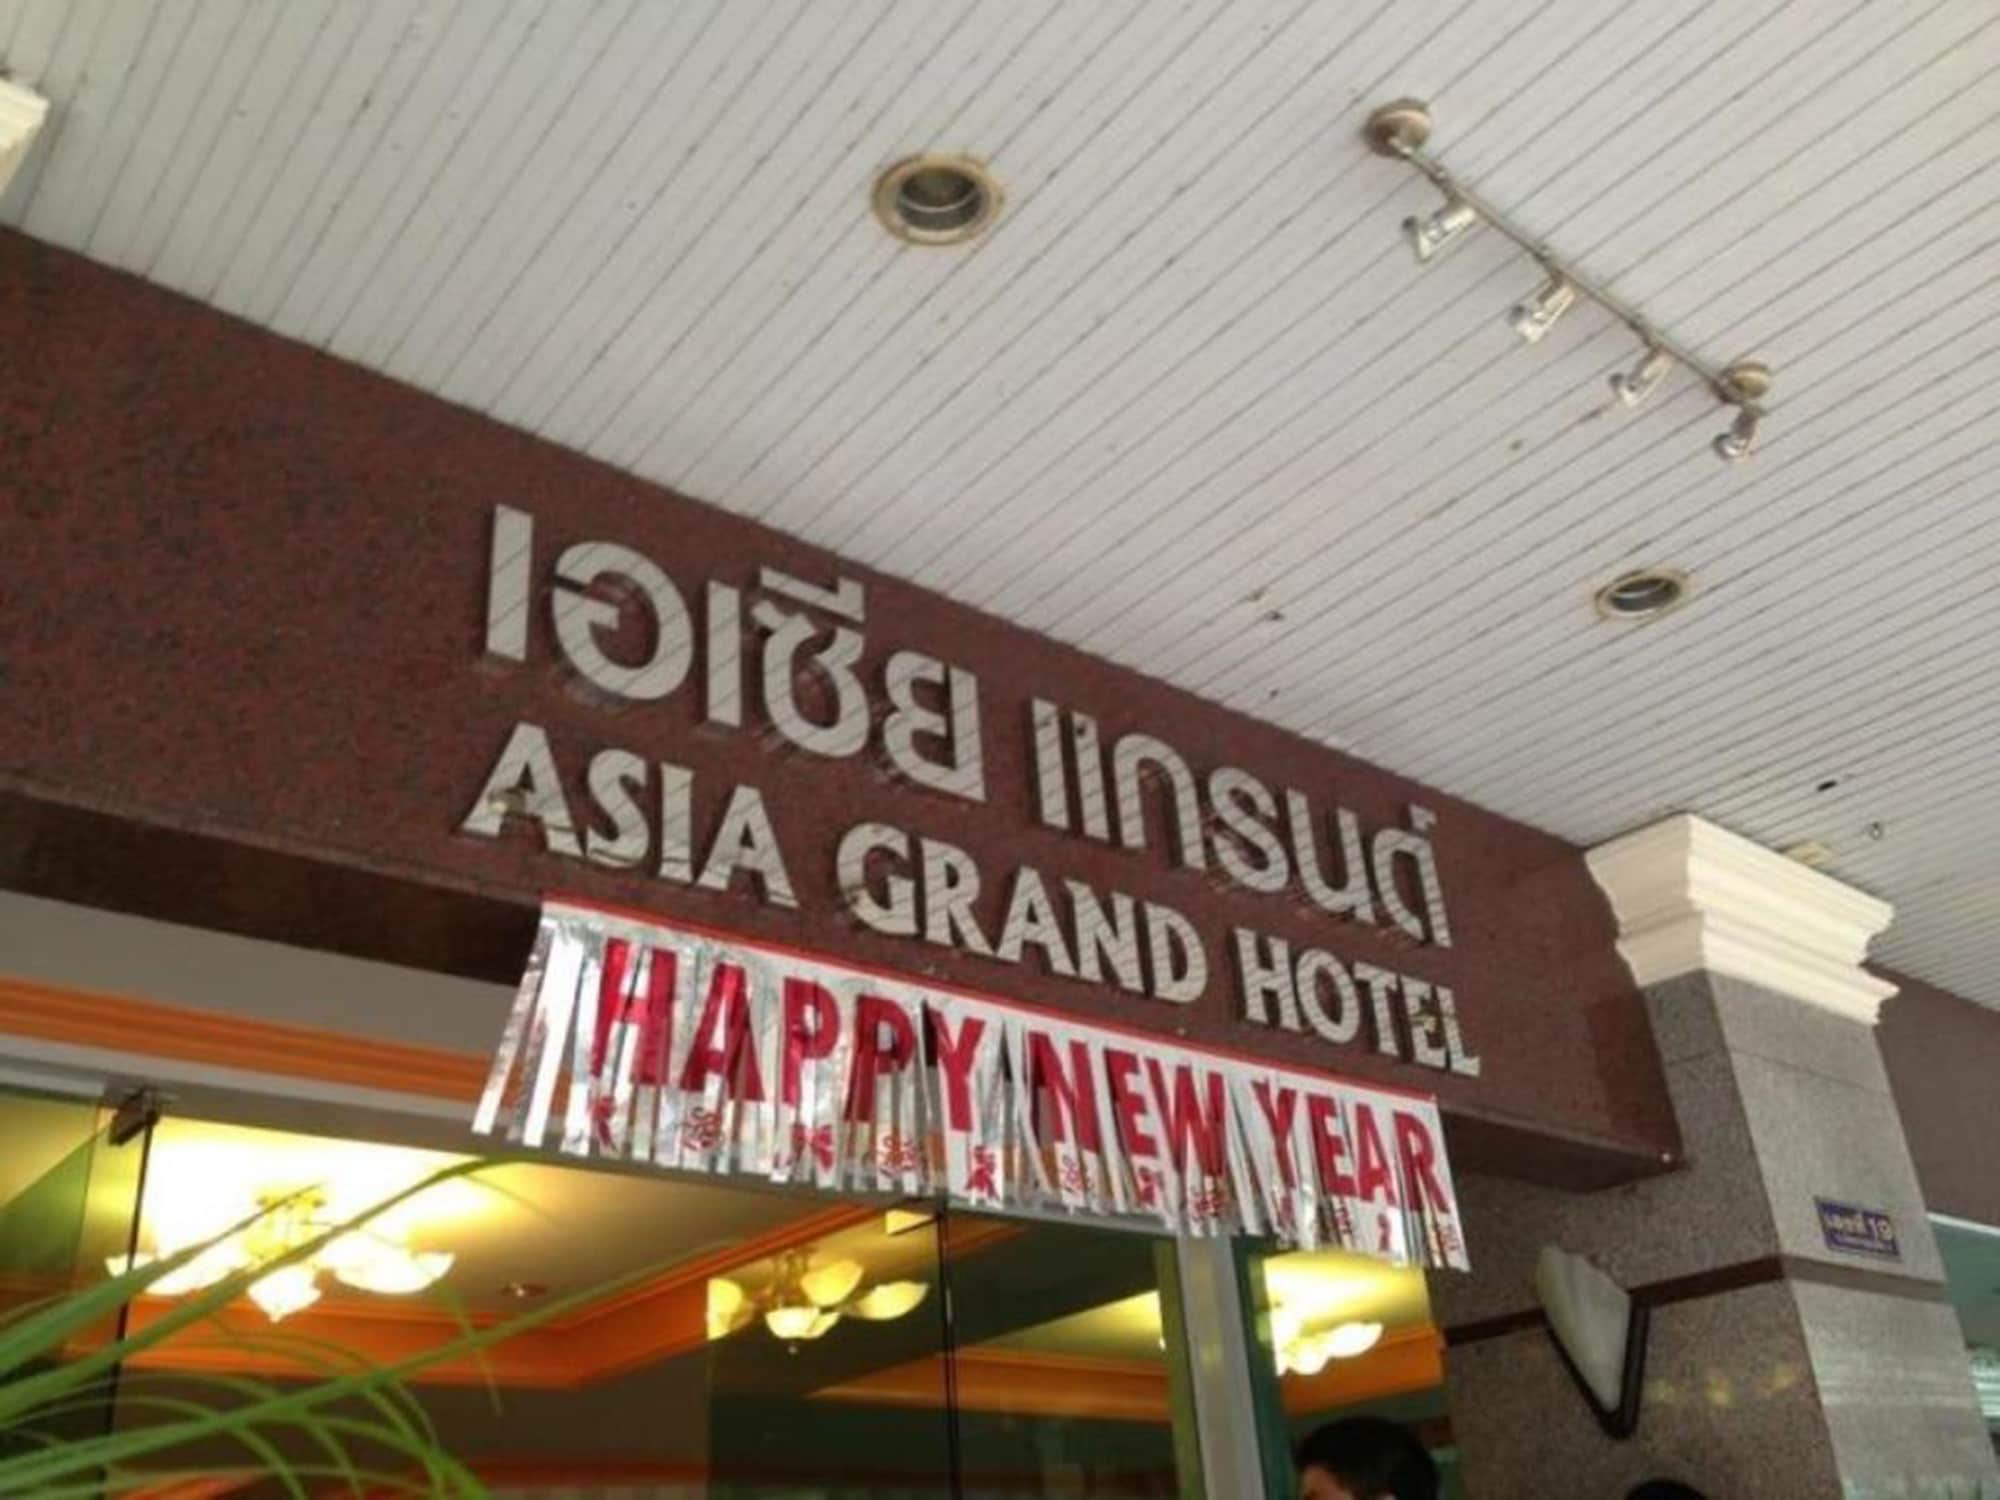 Asia Grand Hotel Hat Yai, Hat Yai